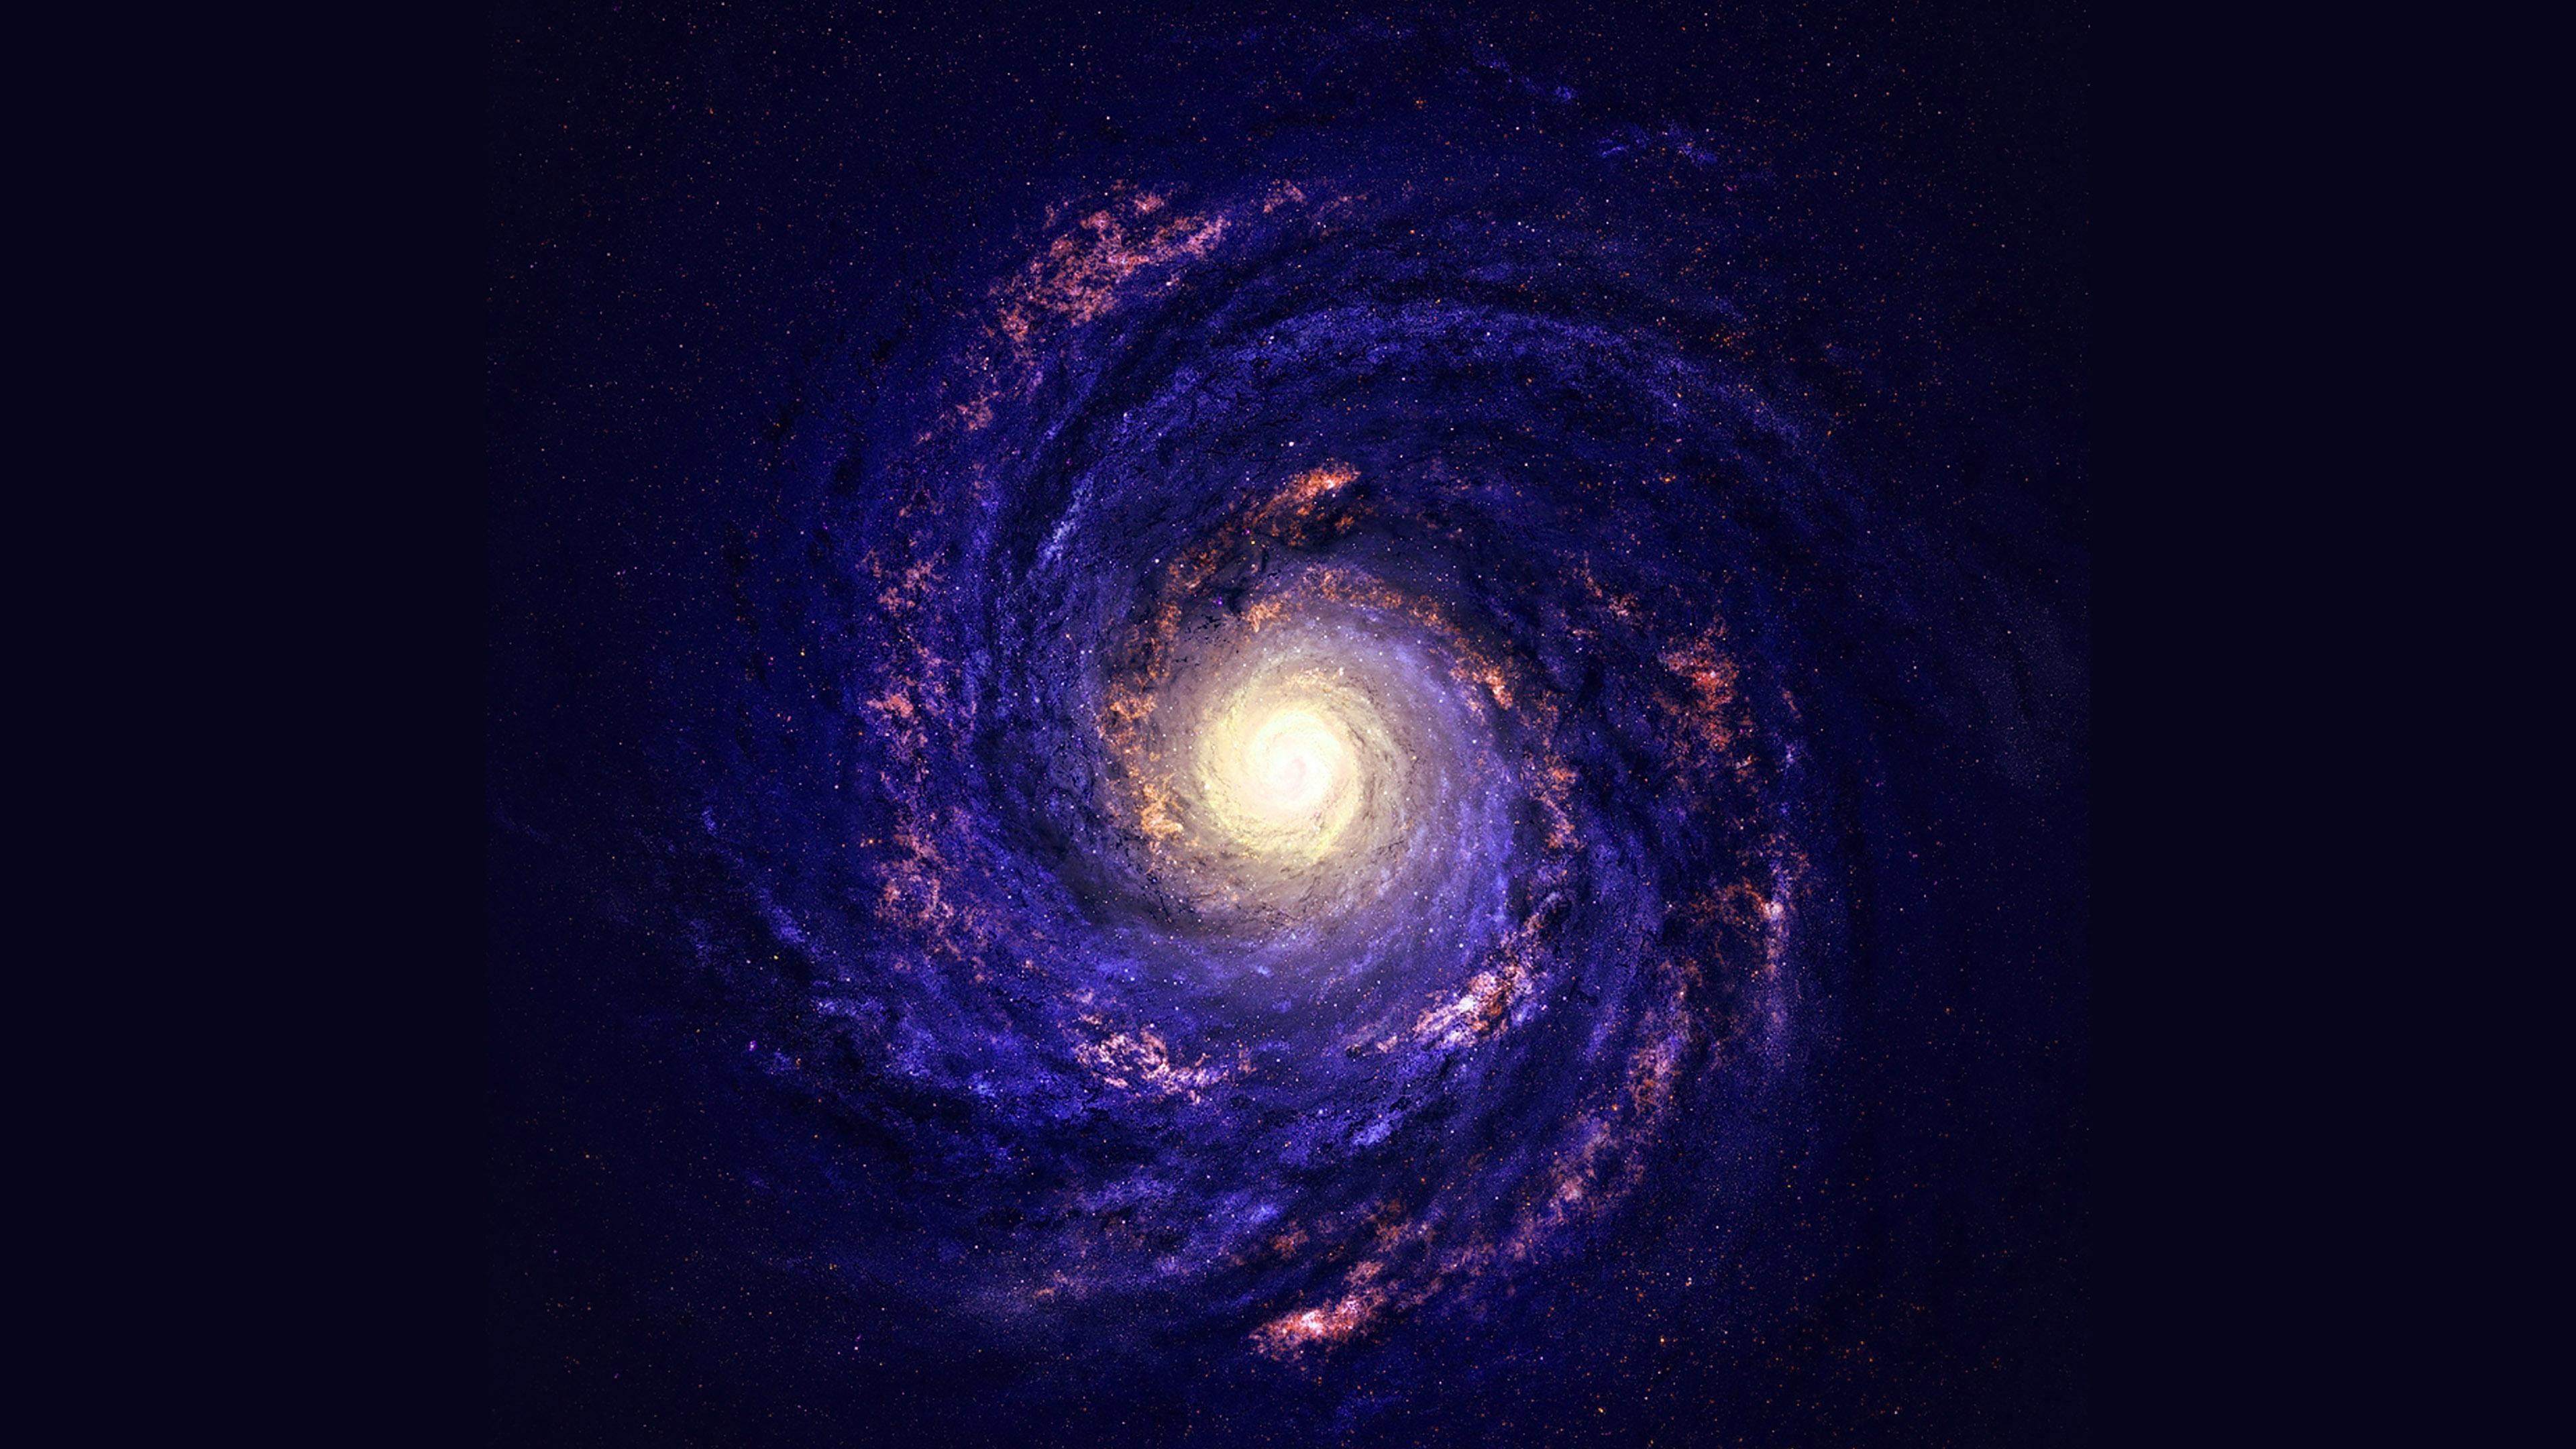 papers.co mc42 wallpaper space galaxy stars milky way blue 35 3840x2160 4k wallpaper